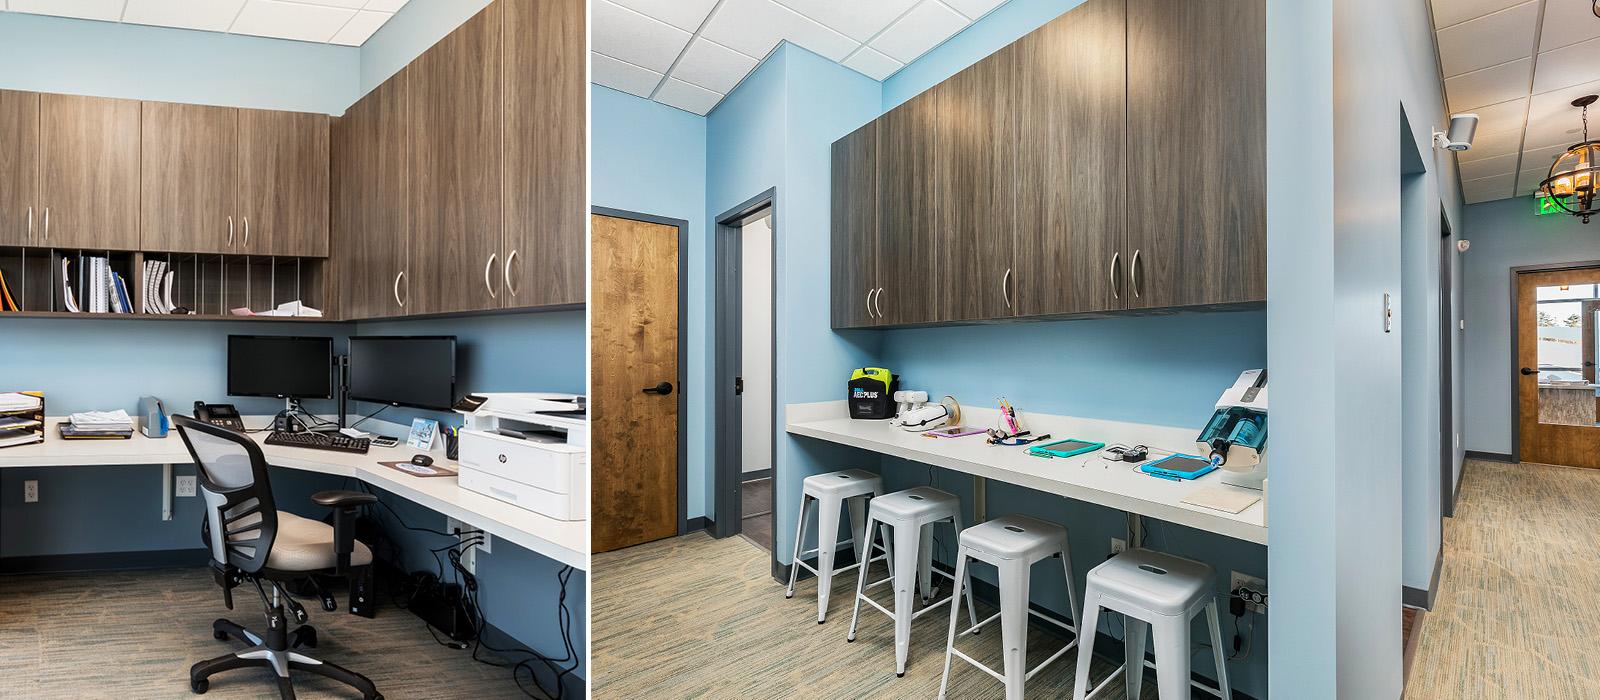 Dental Design of New England administrative workspaces